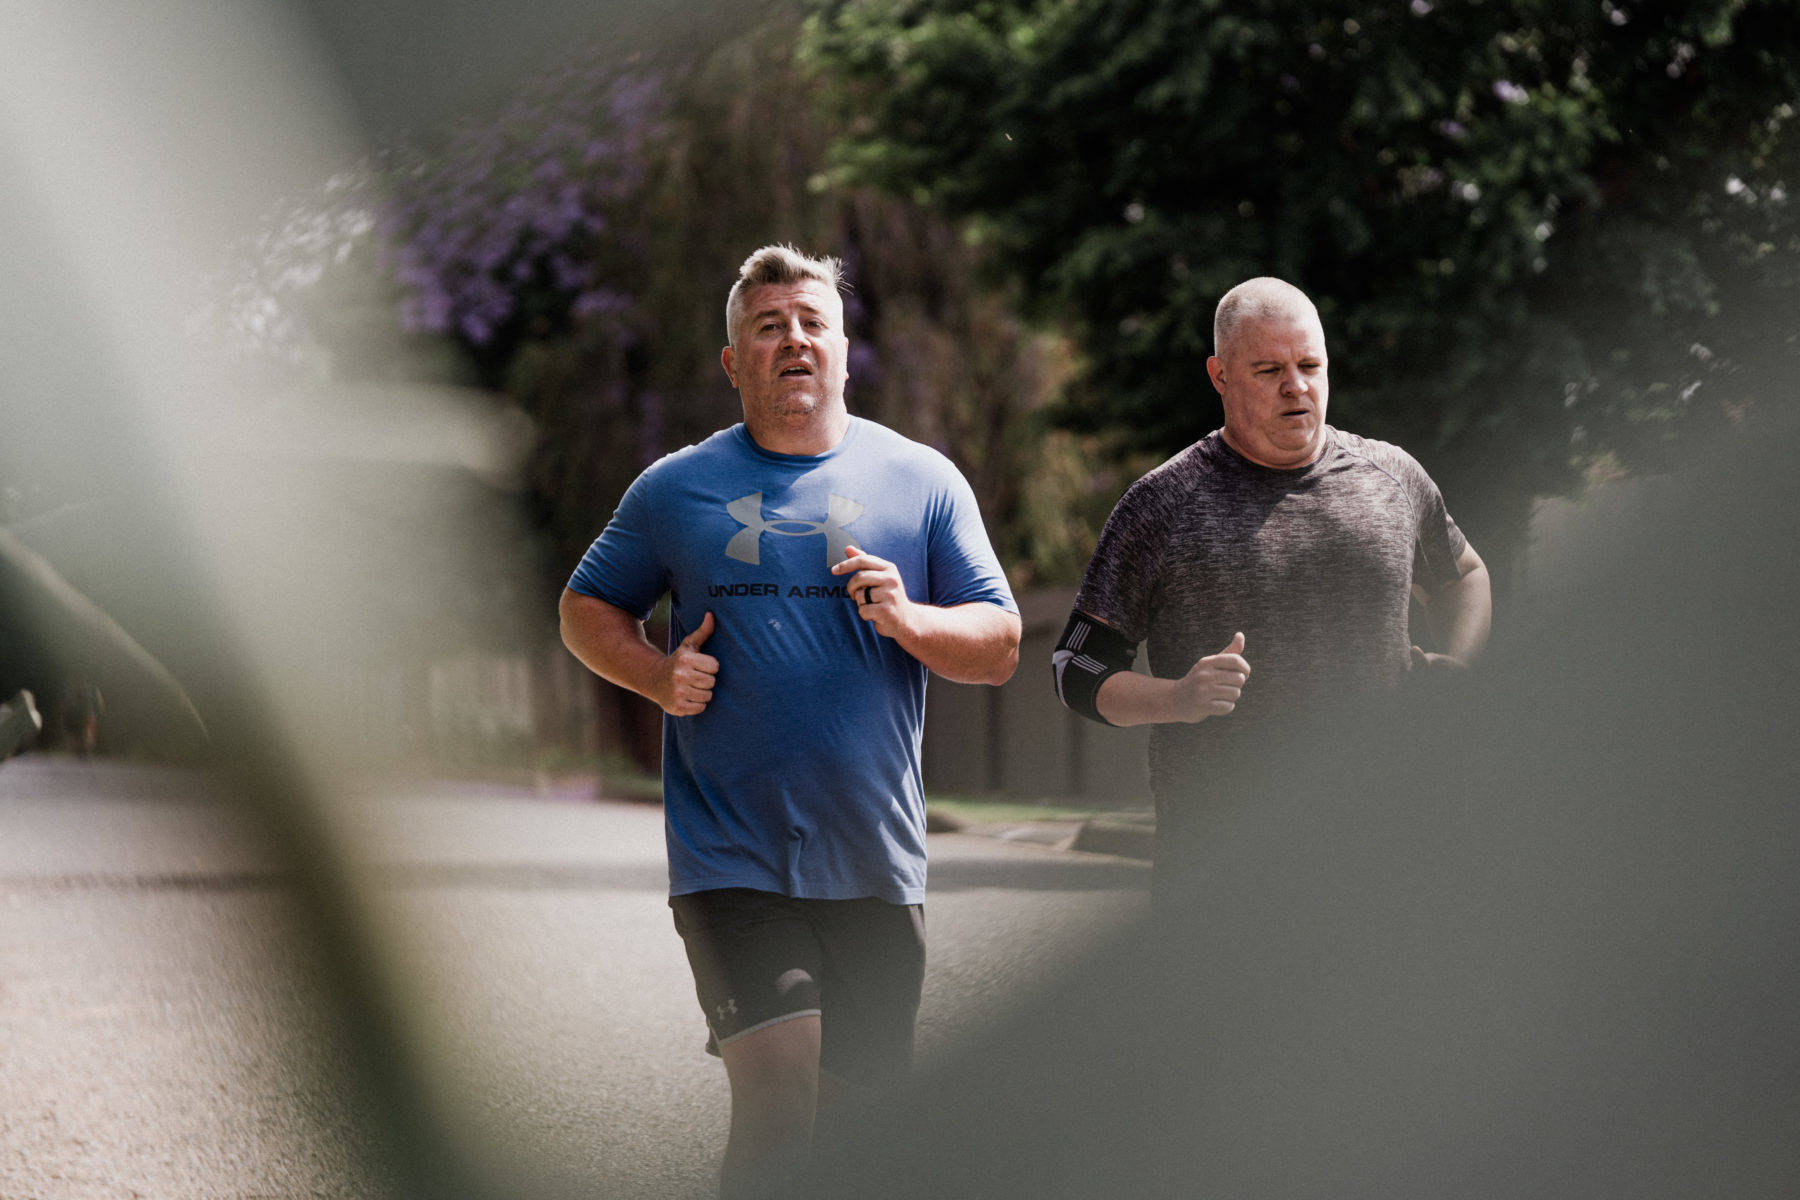 Endurance and Triathlon